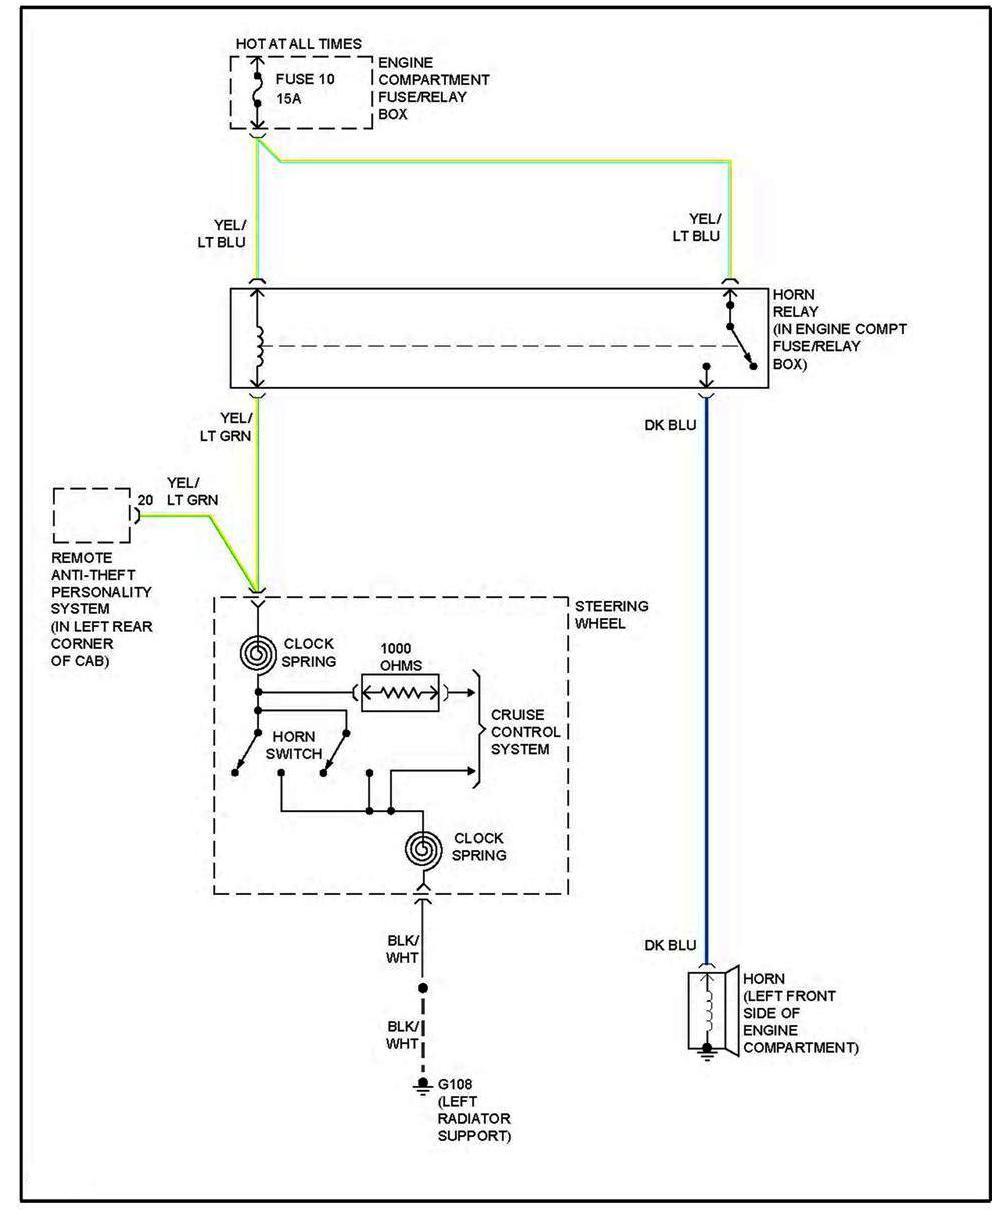 1998 mazda b2500 you a wiring diagram 5spd